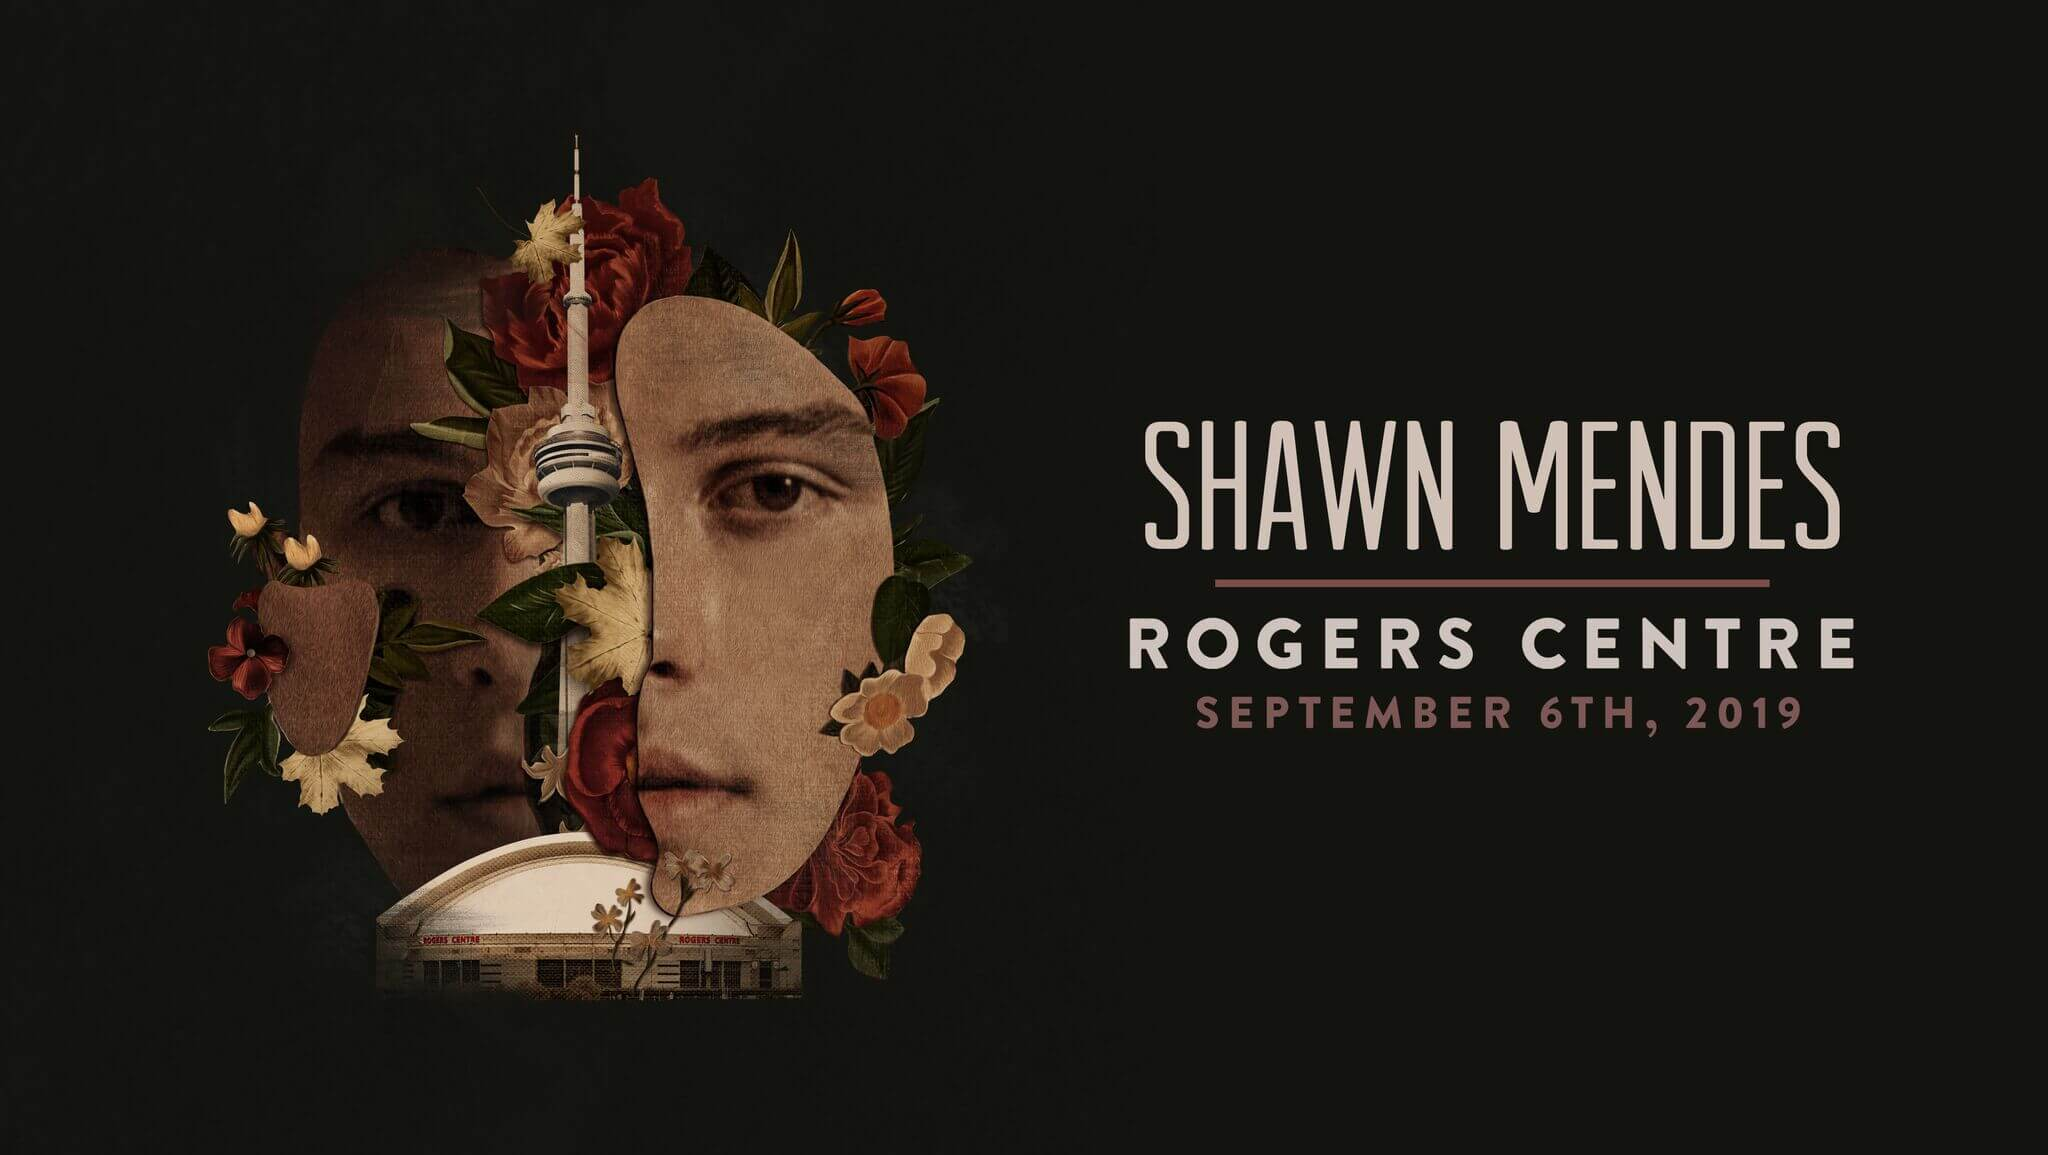 Shawn Mendes Headline Tour 2019